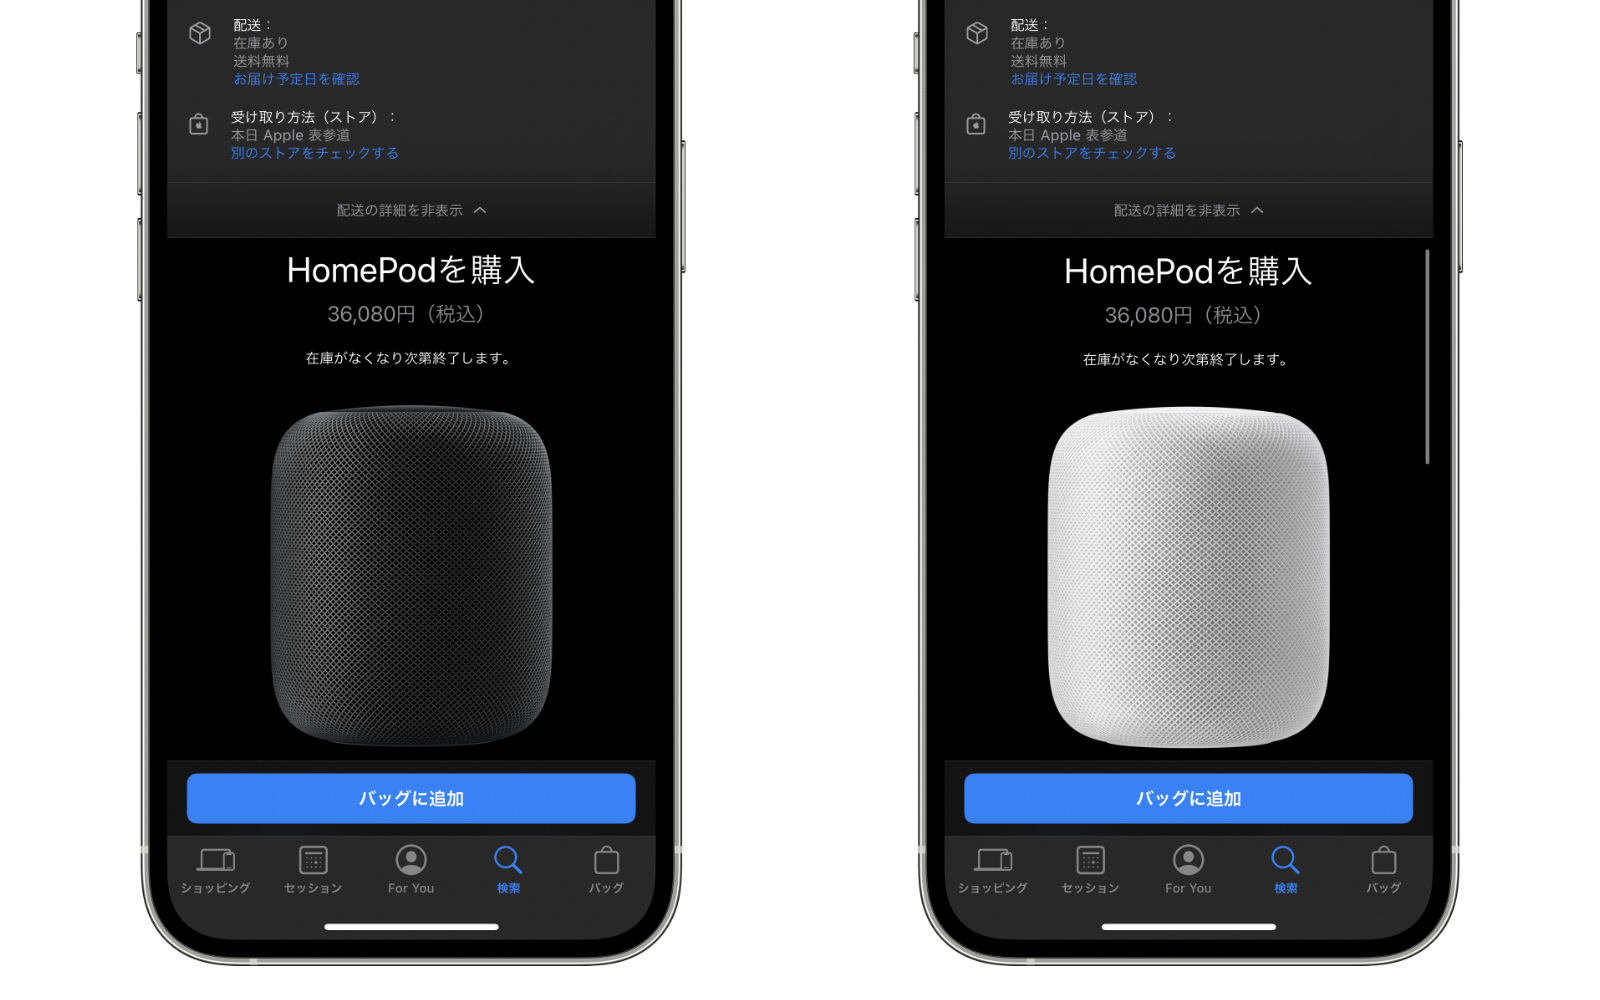 HomePod Still on sale